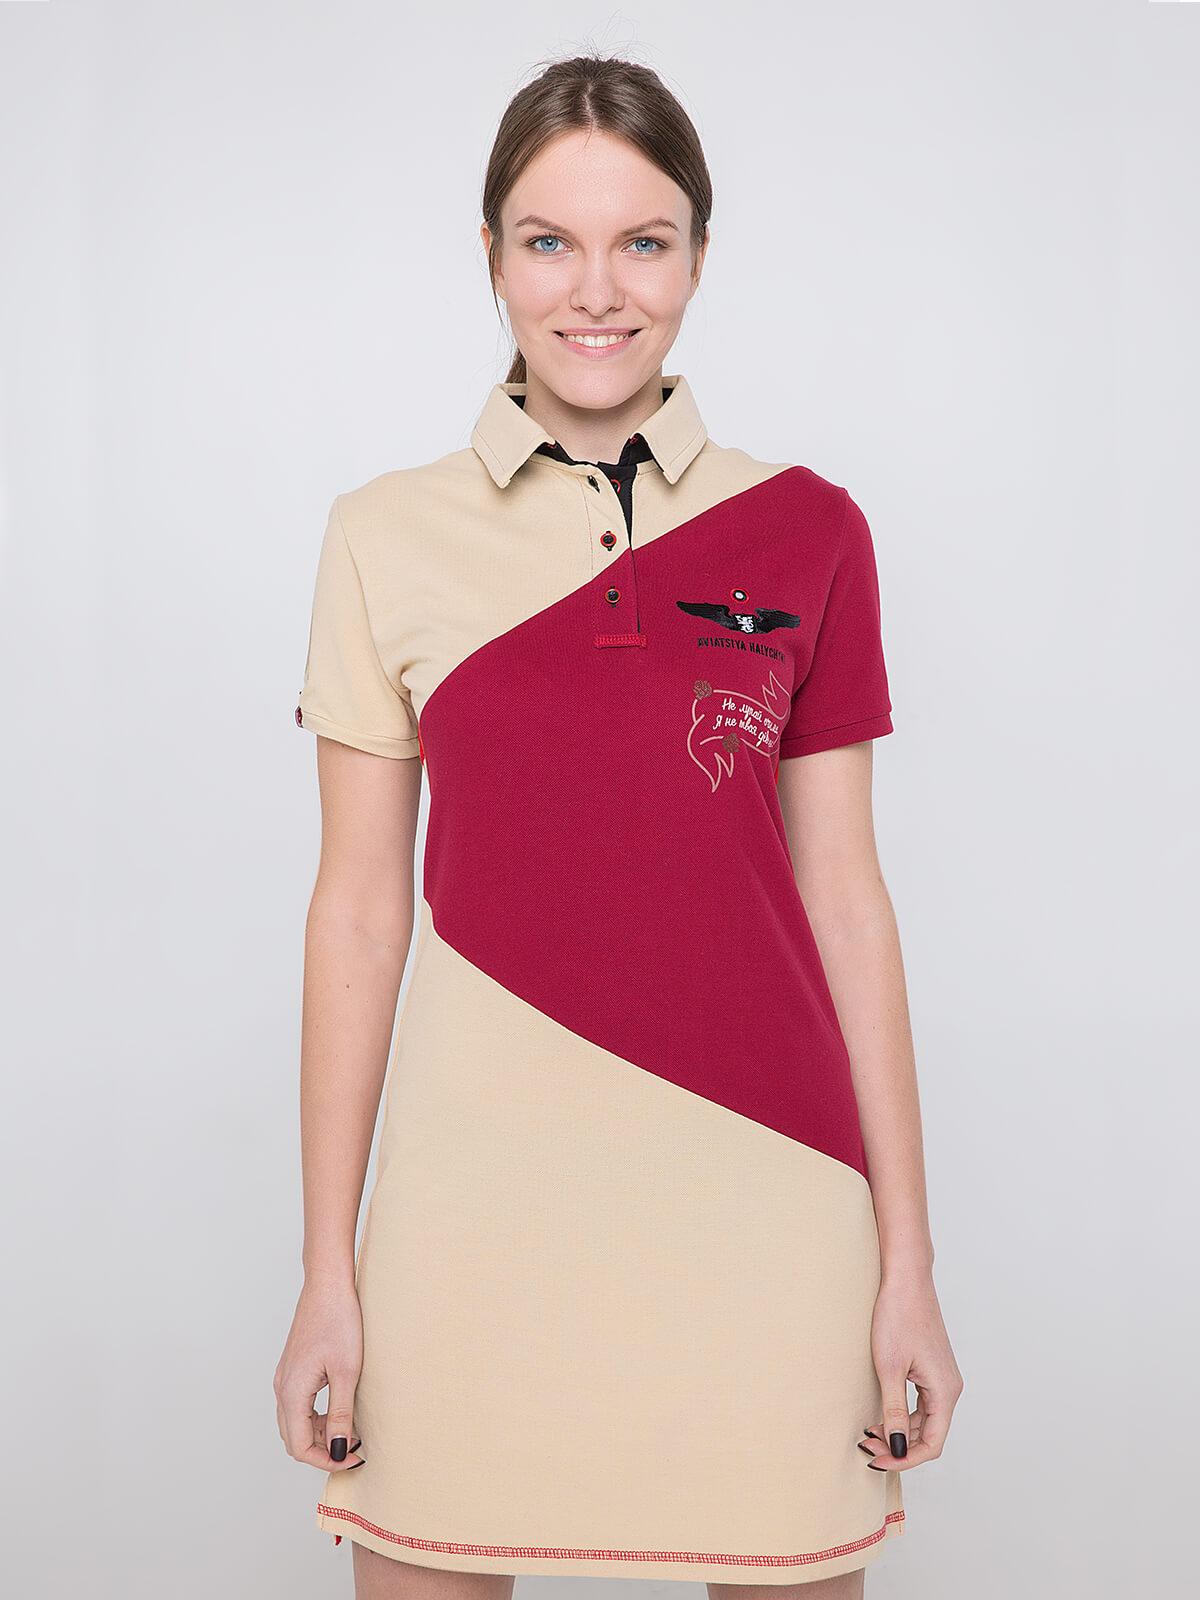 Women's Dress-Polo Shirt Olenka. Color ivory. Pique fabric: 100% cotton.